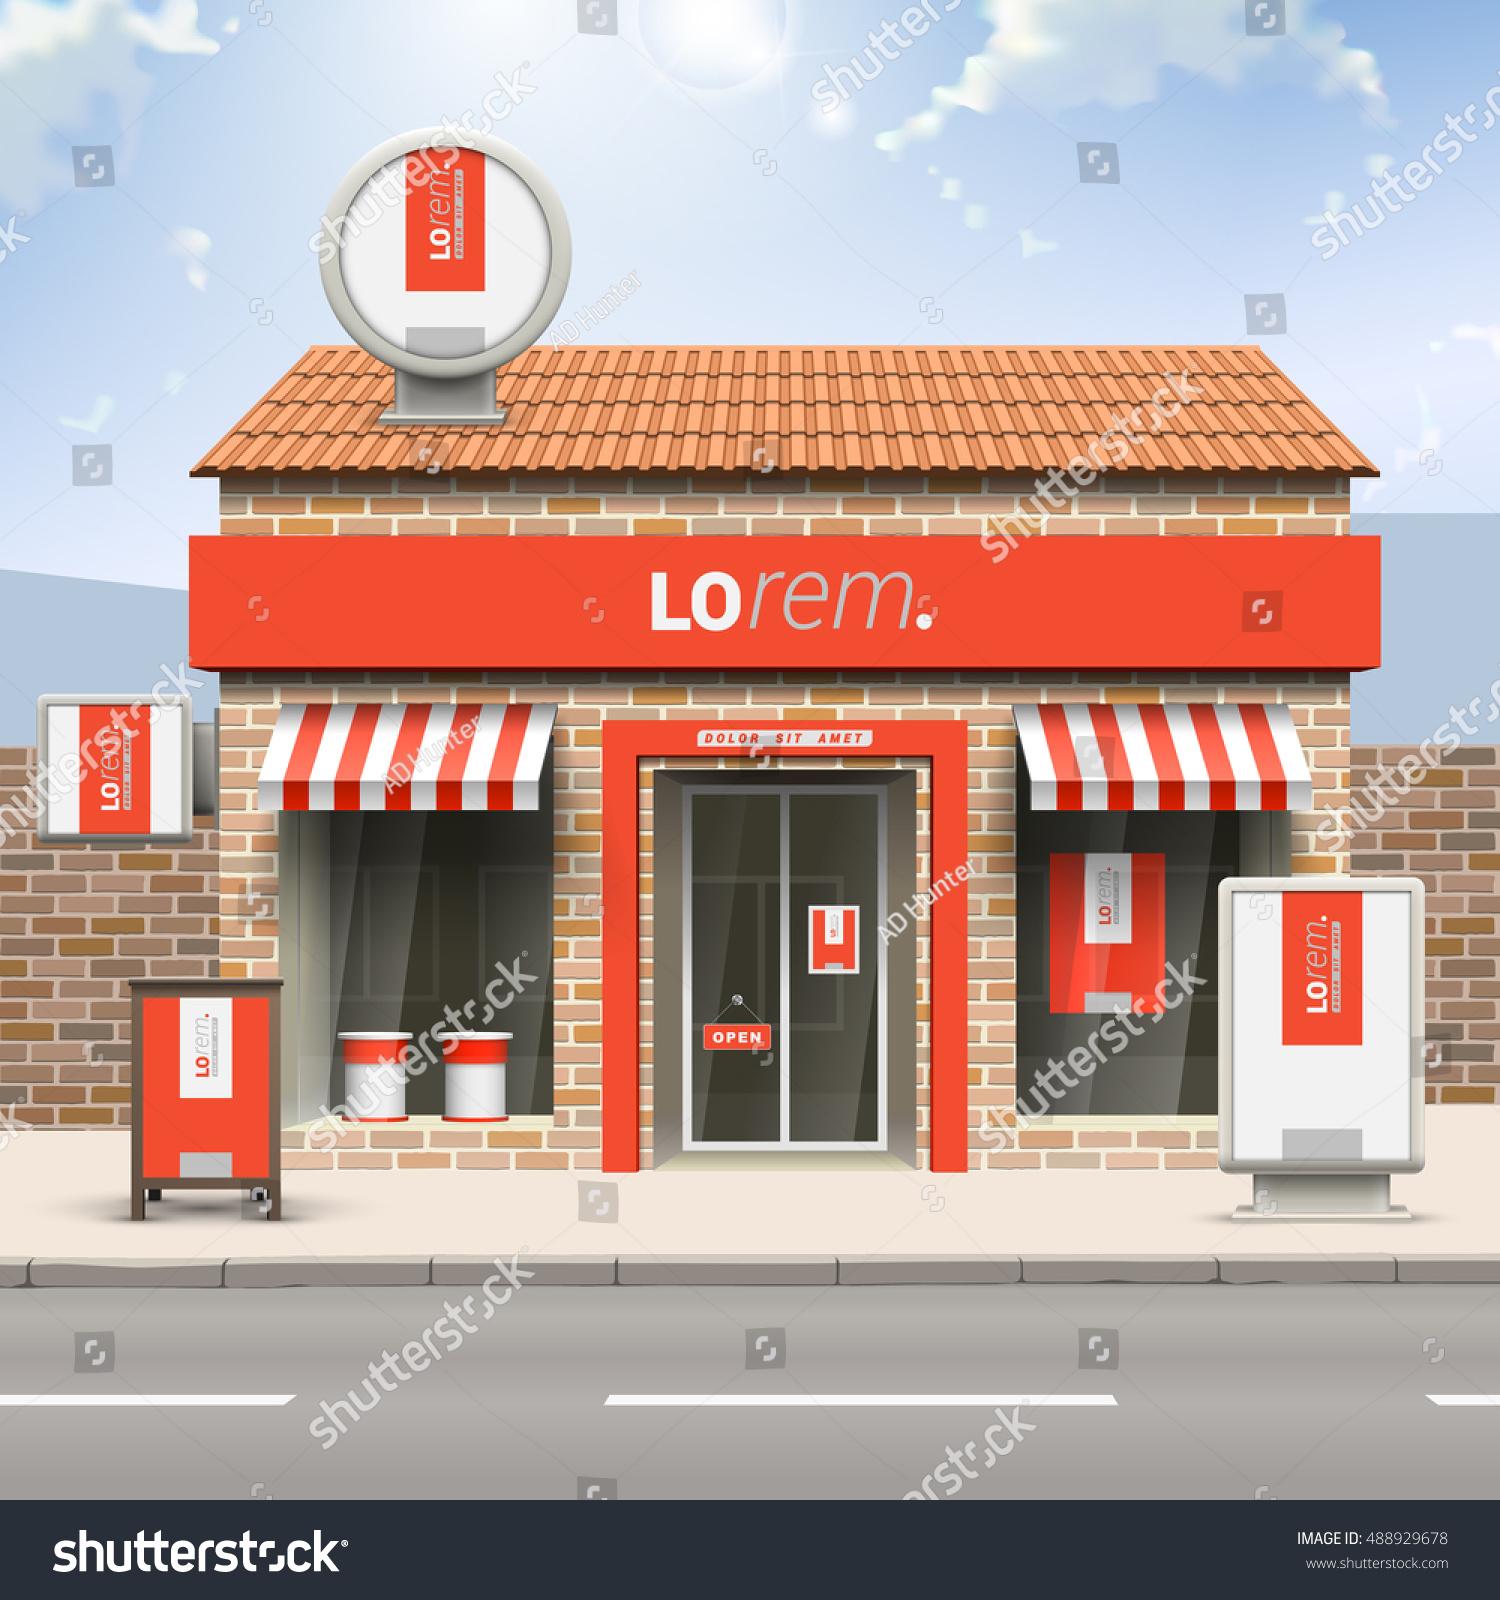 Red store design white vertical shape stock vector for Exterior shop design